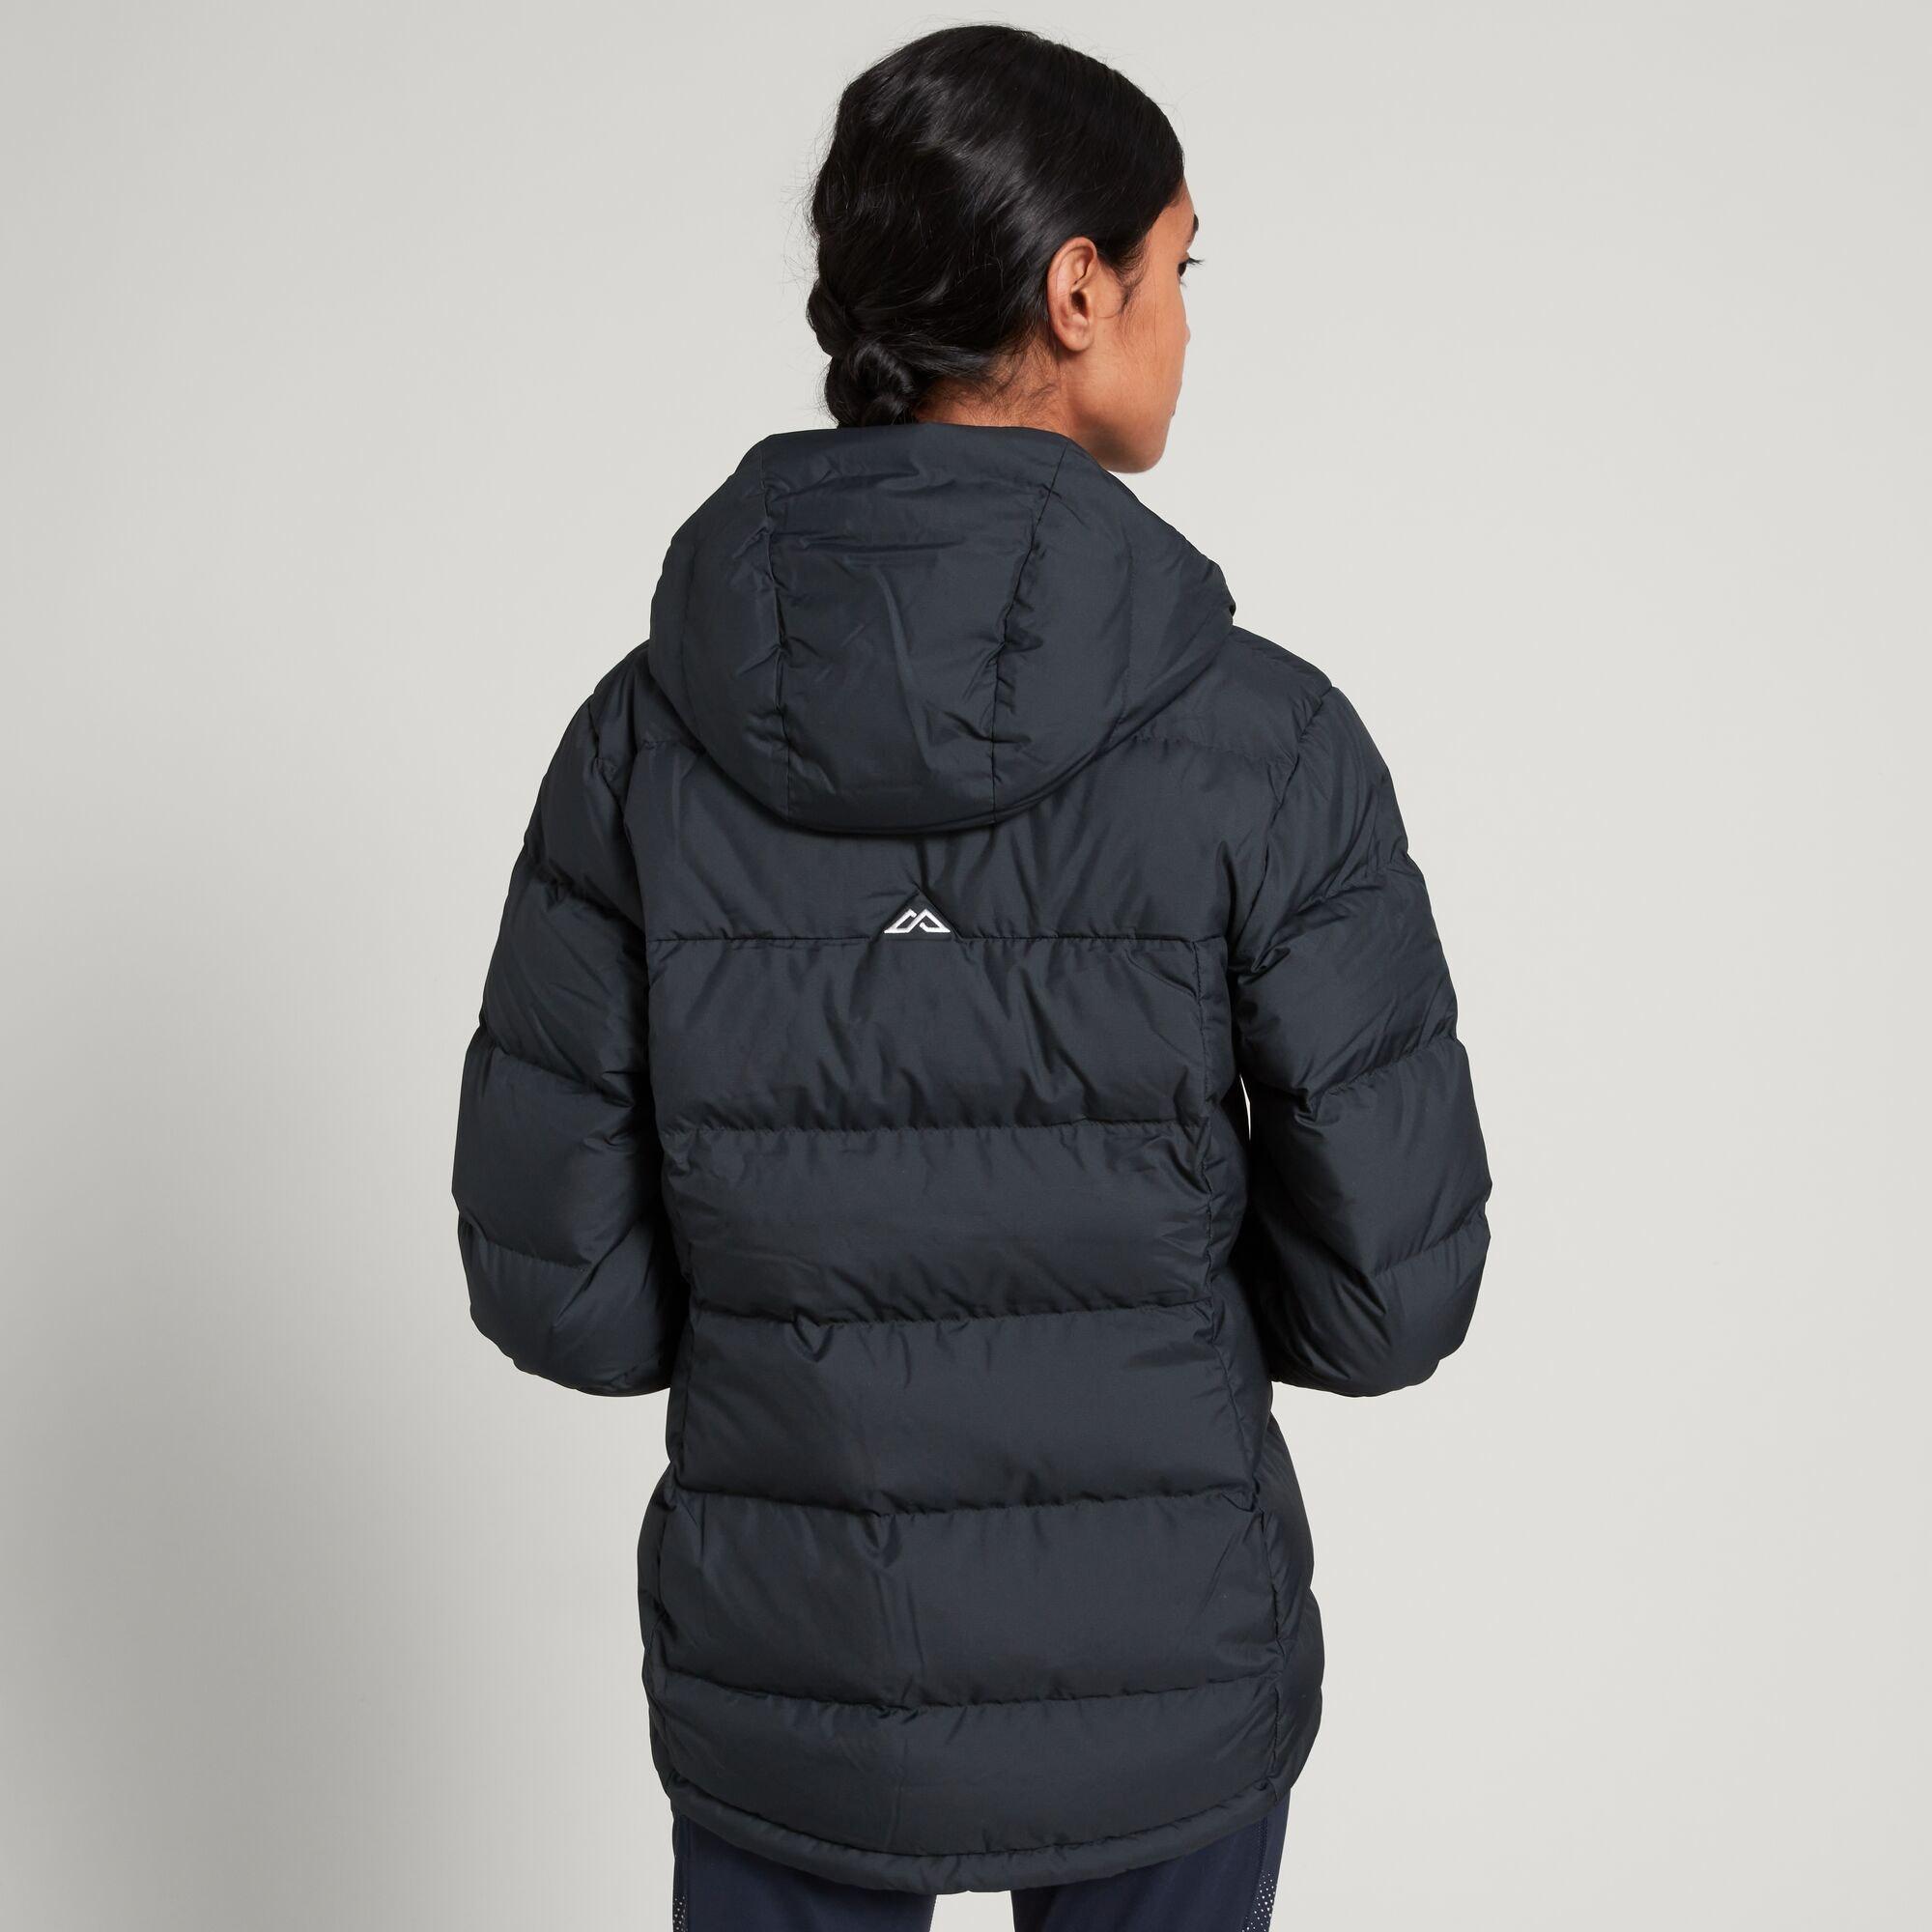 thumbnail 10 - NEW Kathmandu Epiq Womens Hooded Down Puffer 600 Fill Warm Outdoor Winter Jacket